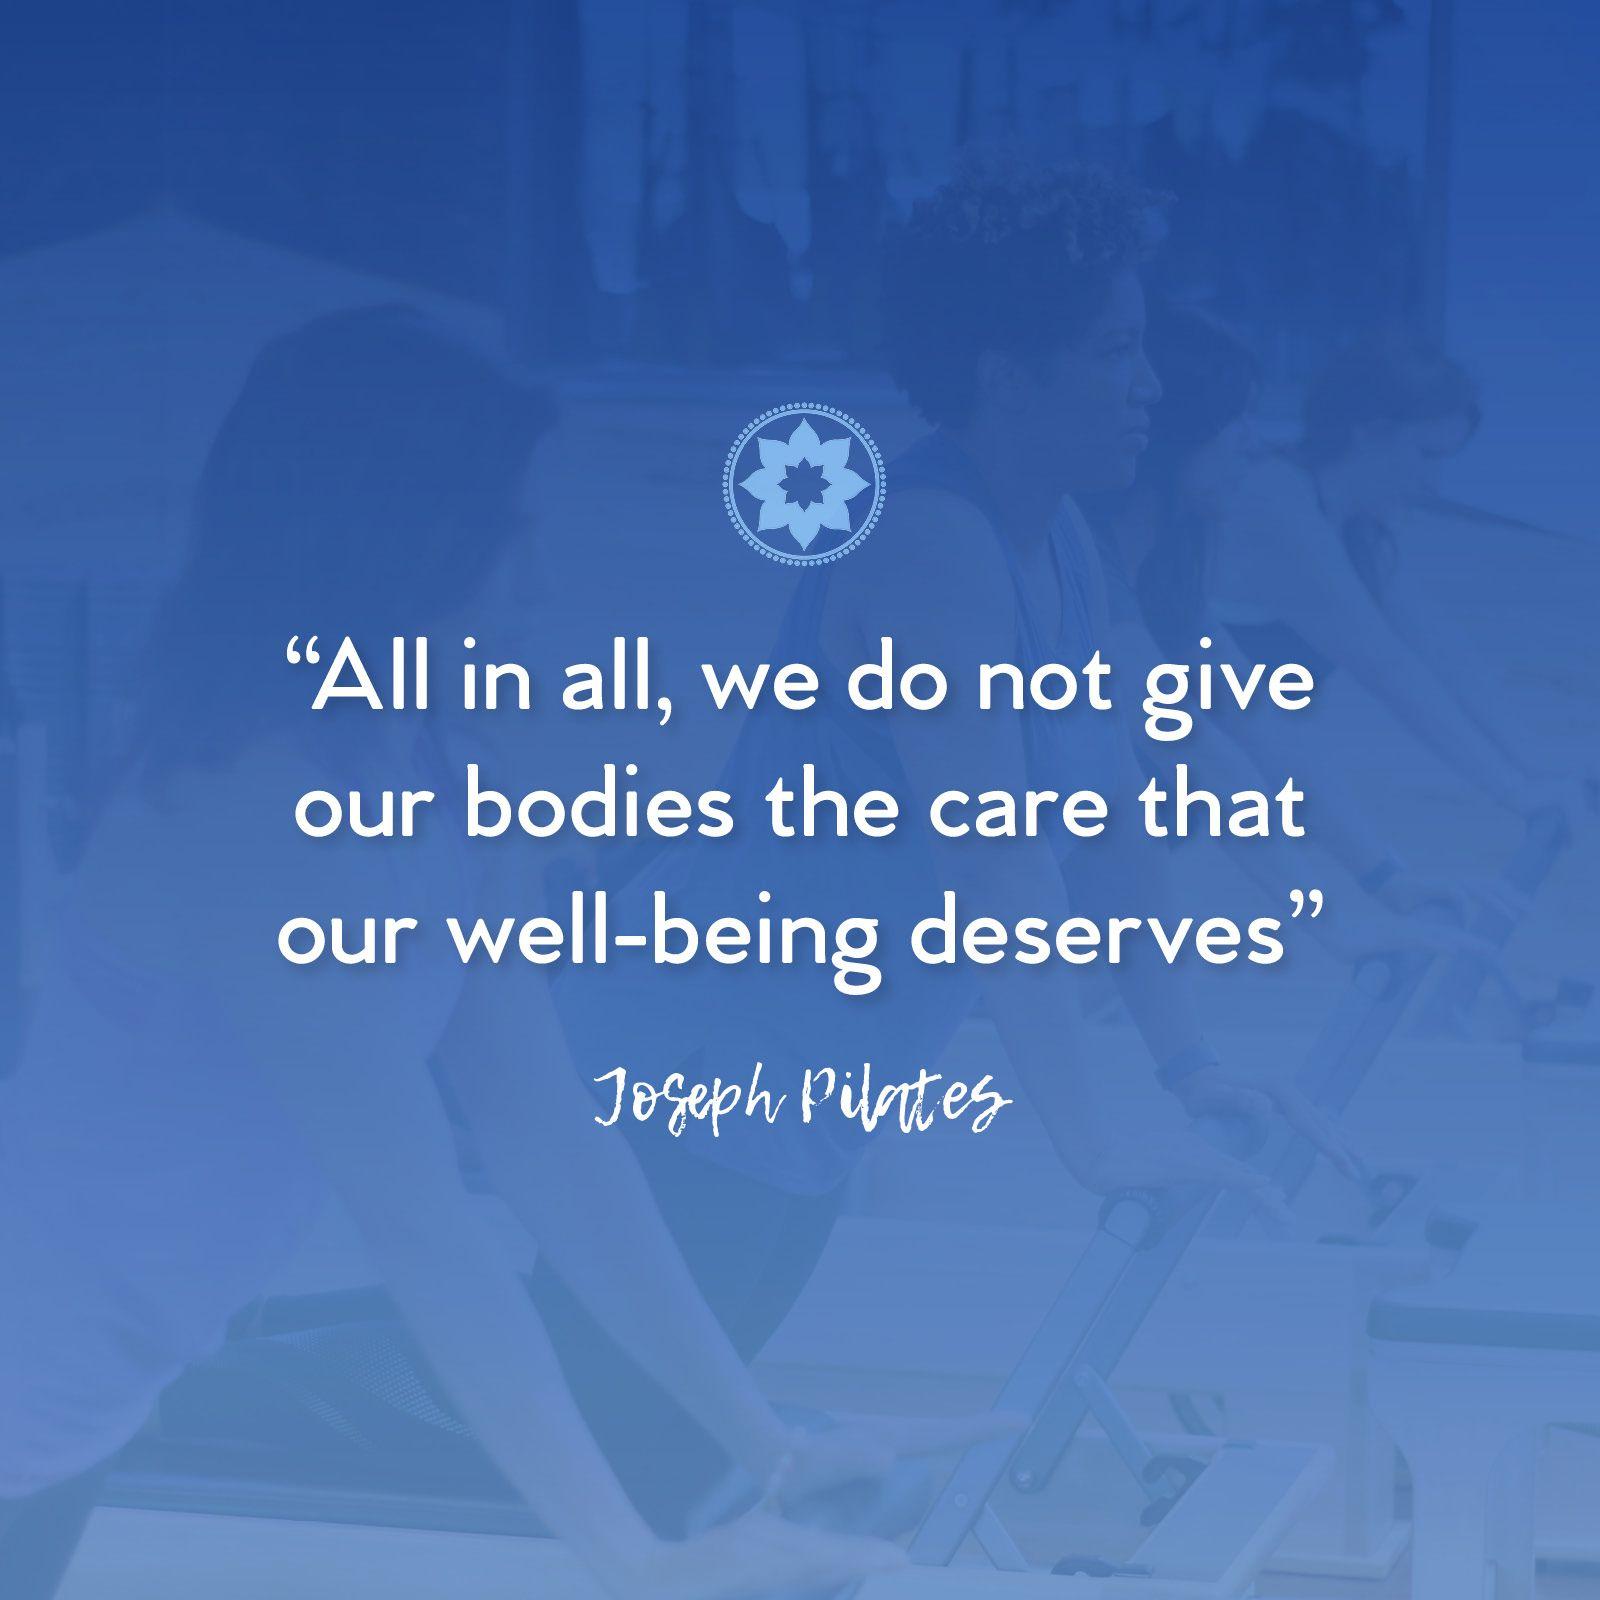 Joseph Pilates Quotes Movement Heals